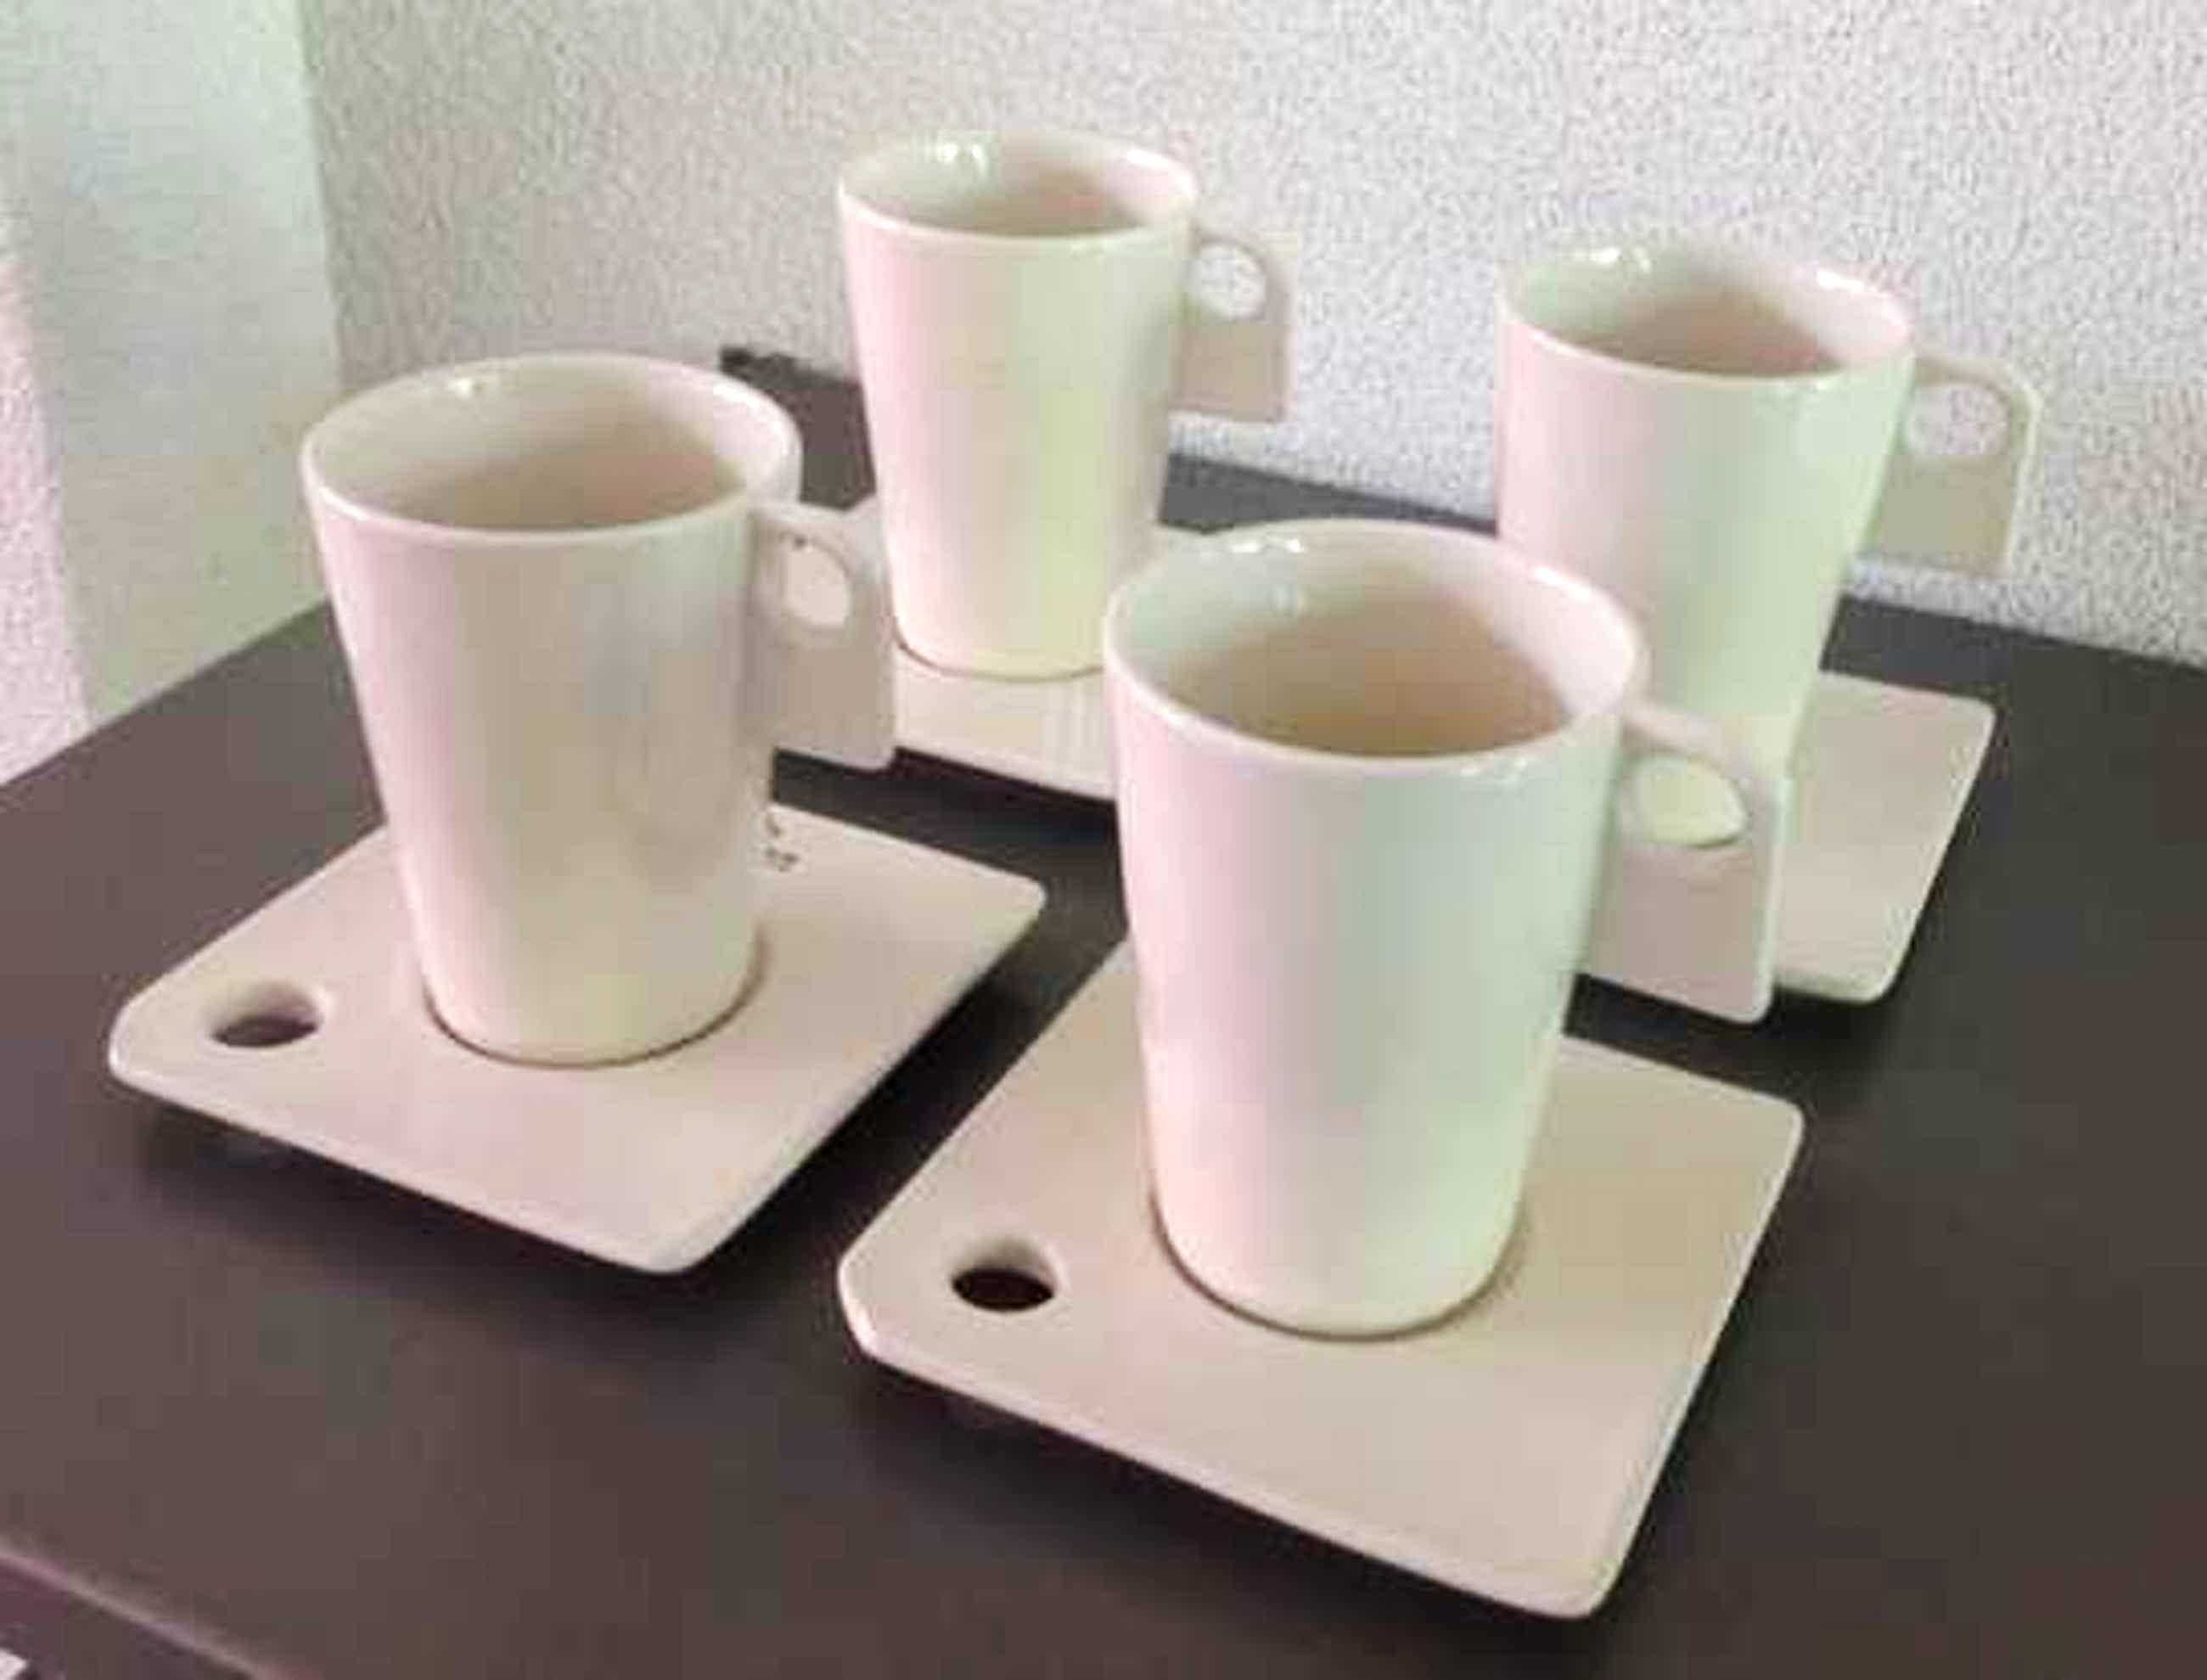 Royal Boch - Marc Pairon koffieset Zeosen kopen? Bied vanaf 29!